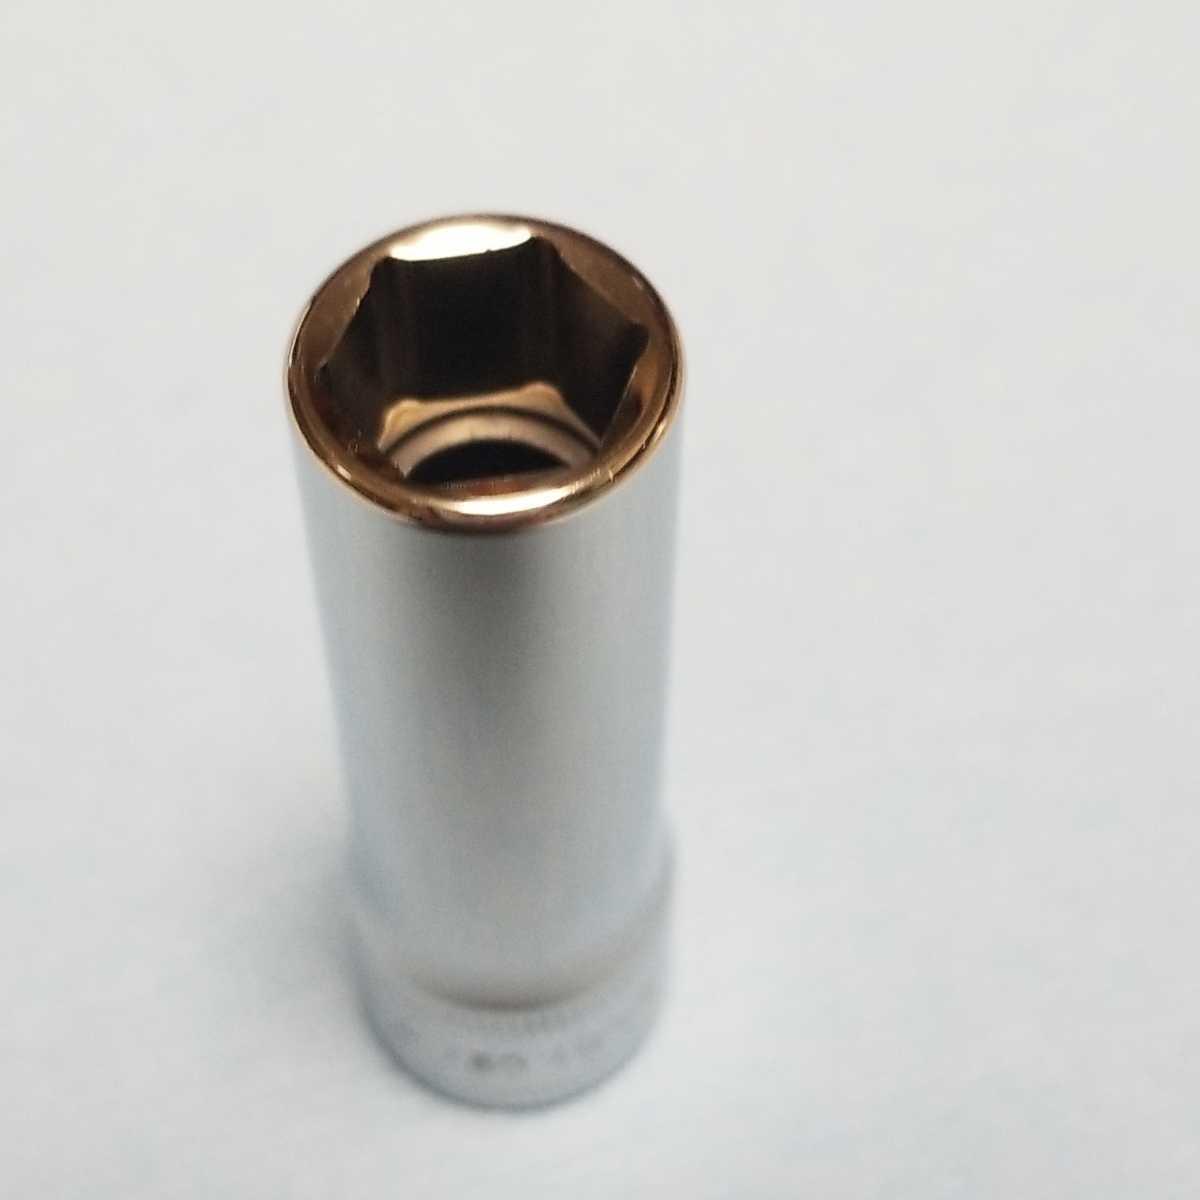 11mm 3/8 ディープ スナップオン SFSM11 (6角) 中古品 超美品 保管品 SNAPON SNAP-ON ディープソケット ソケット 送料無料 Snap-on _画像3